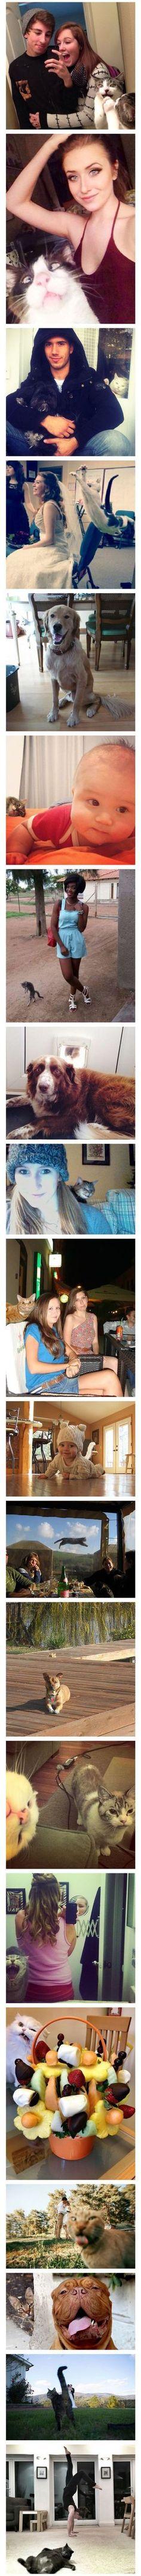 20 Funny Cat Photobombs